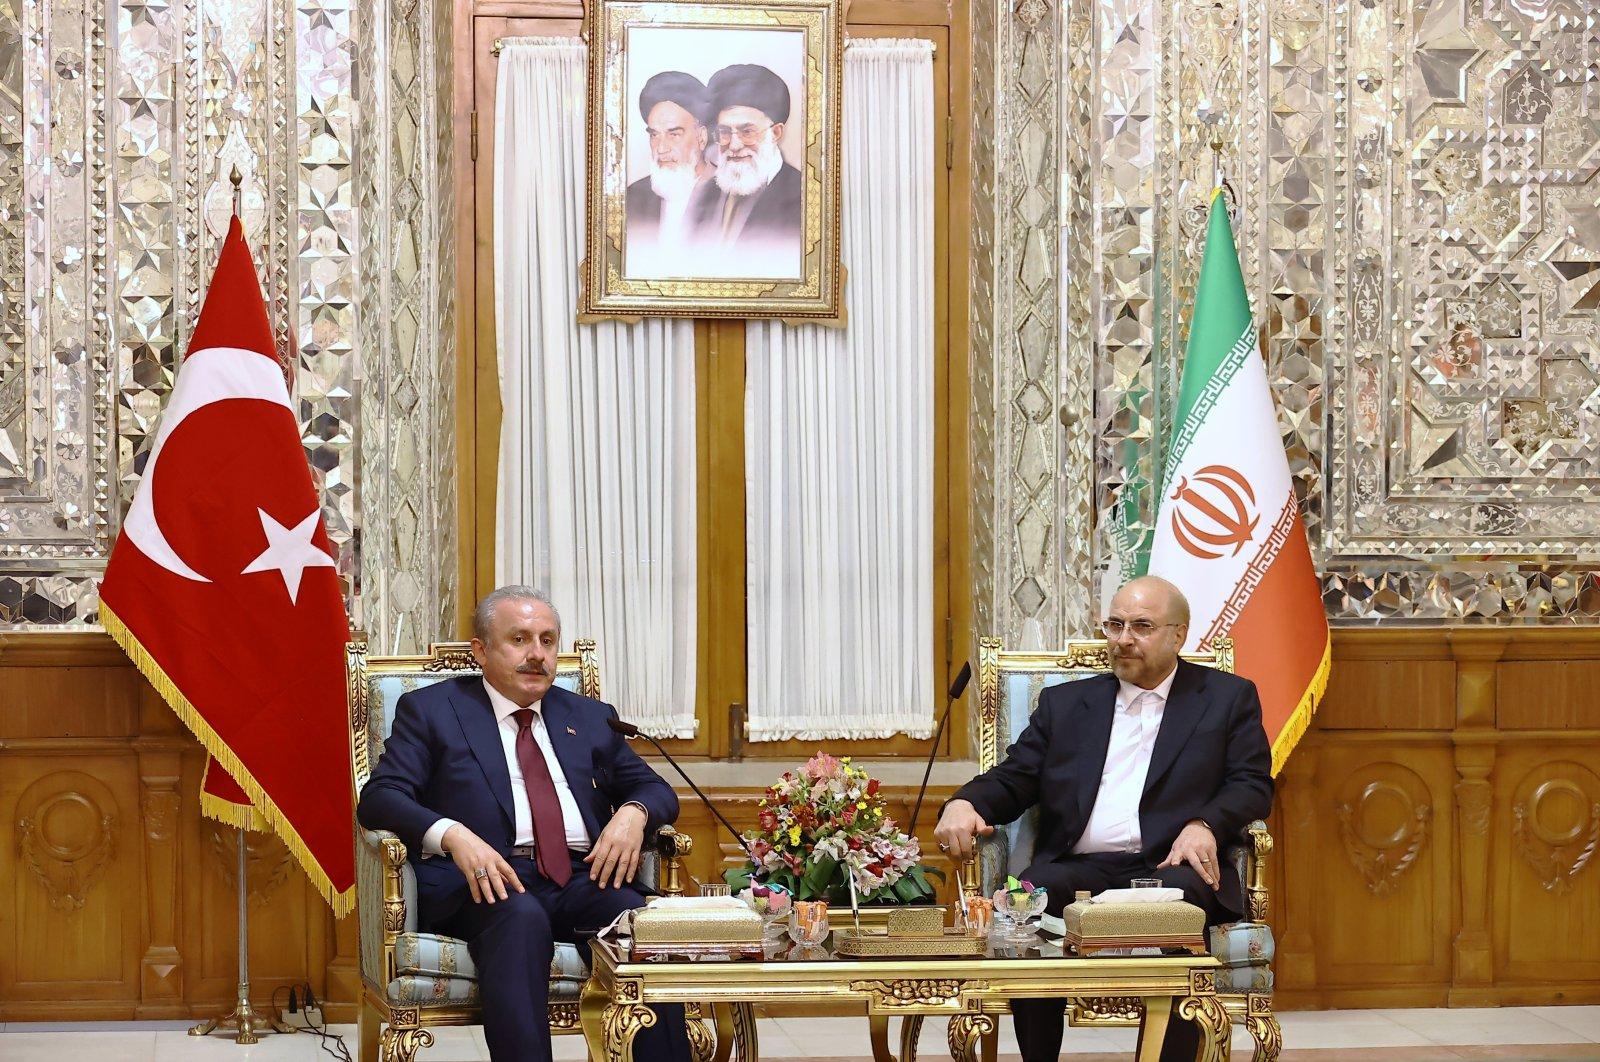 Parliament Speaker Mustafa Şentop meets with Iranian parliament head Mohammad Bagher Ghalibaf in Tehran, Aug. 5, 2021 (AA Photo)